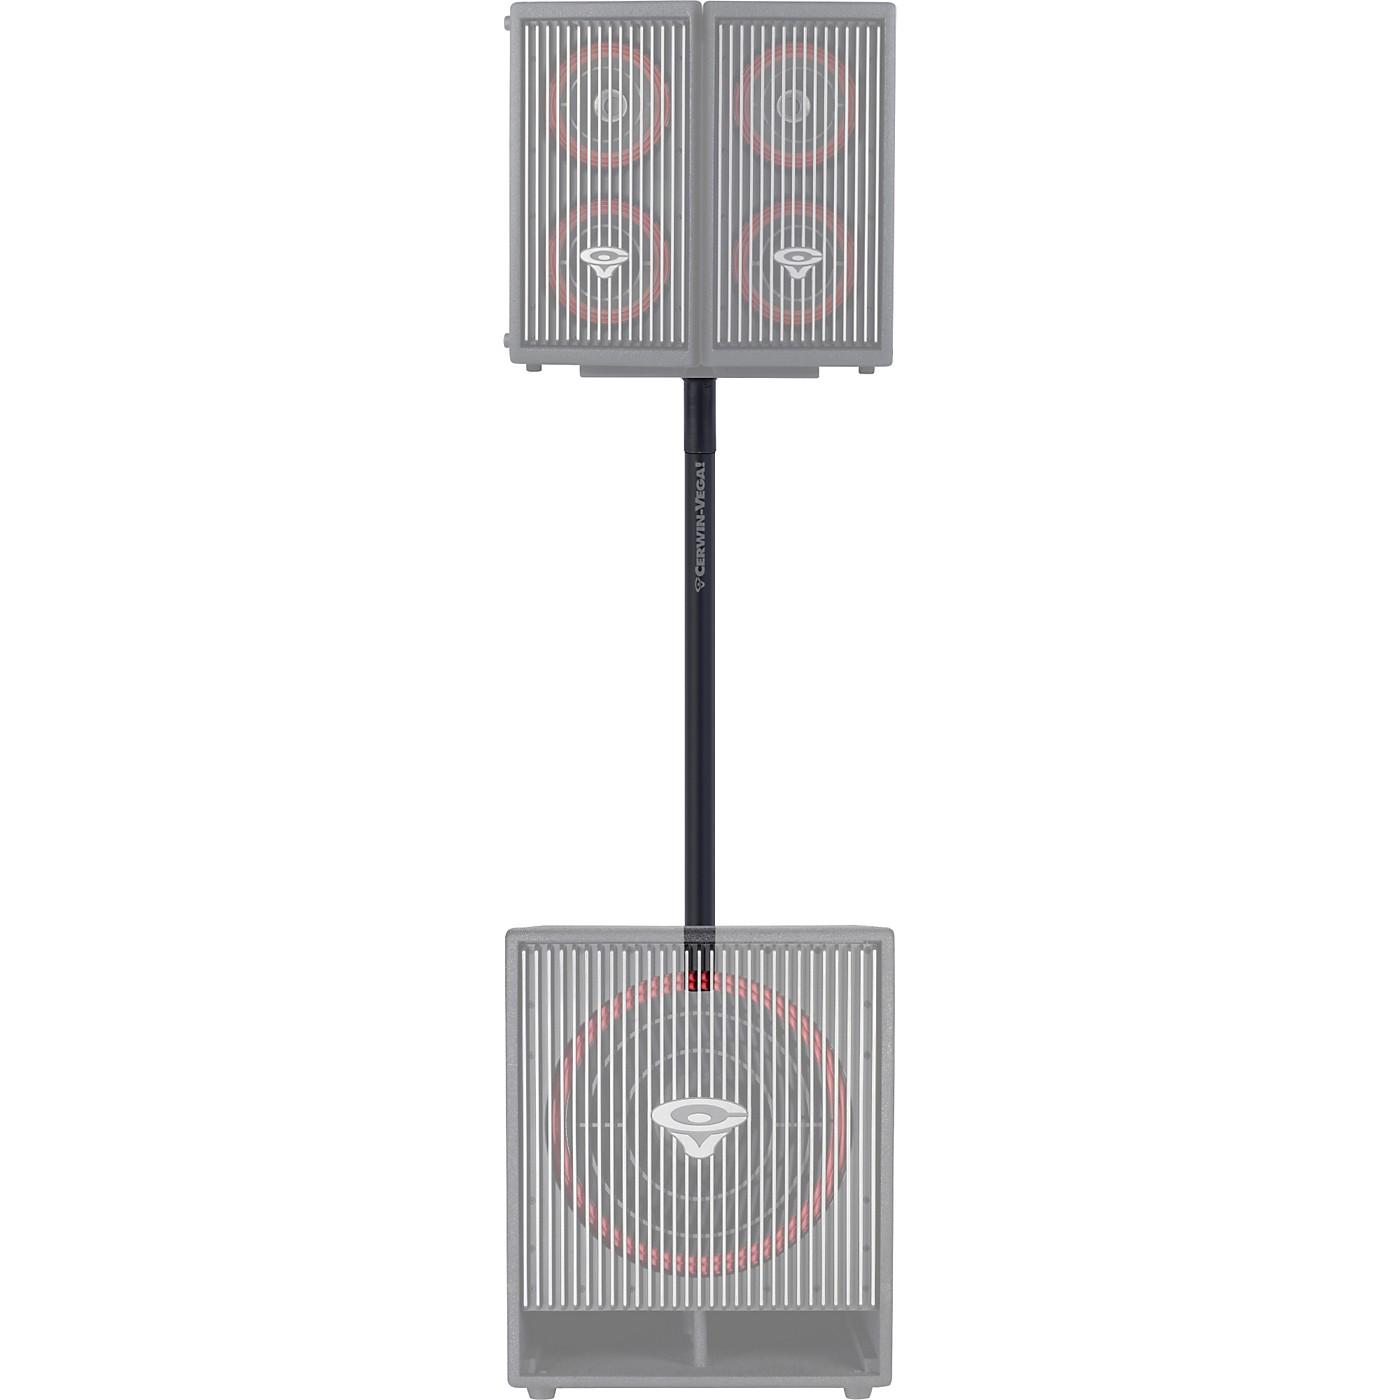 Cerwin-Vega CVPOLE-1A Single Speaker Pole thumbnail